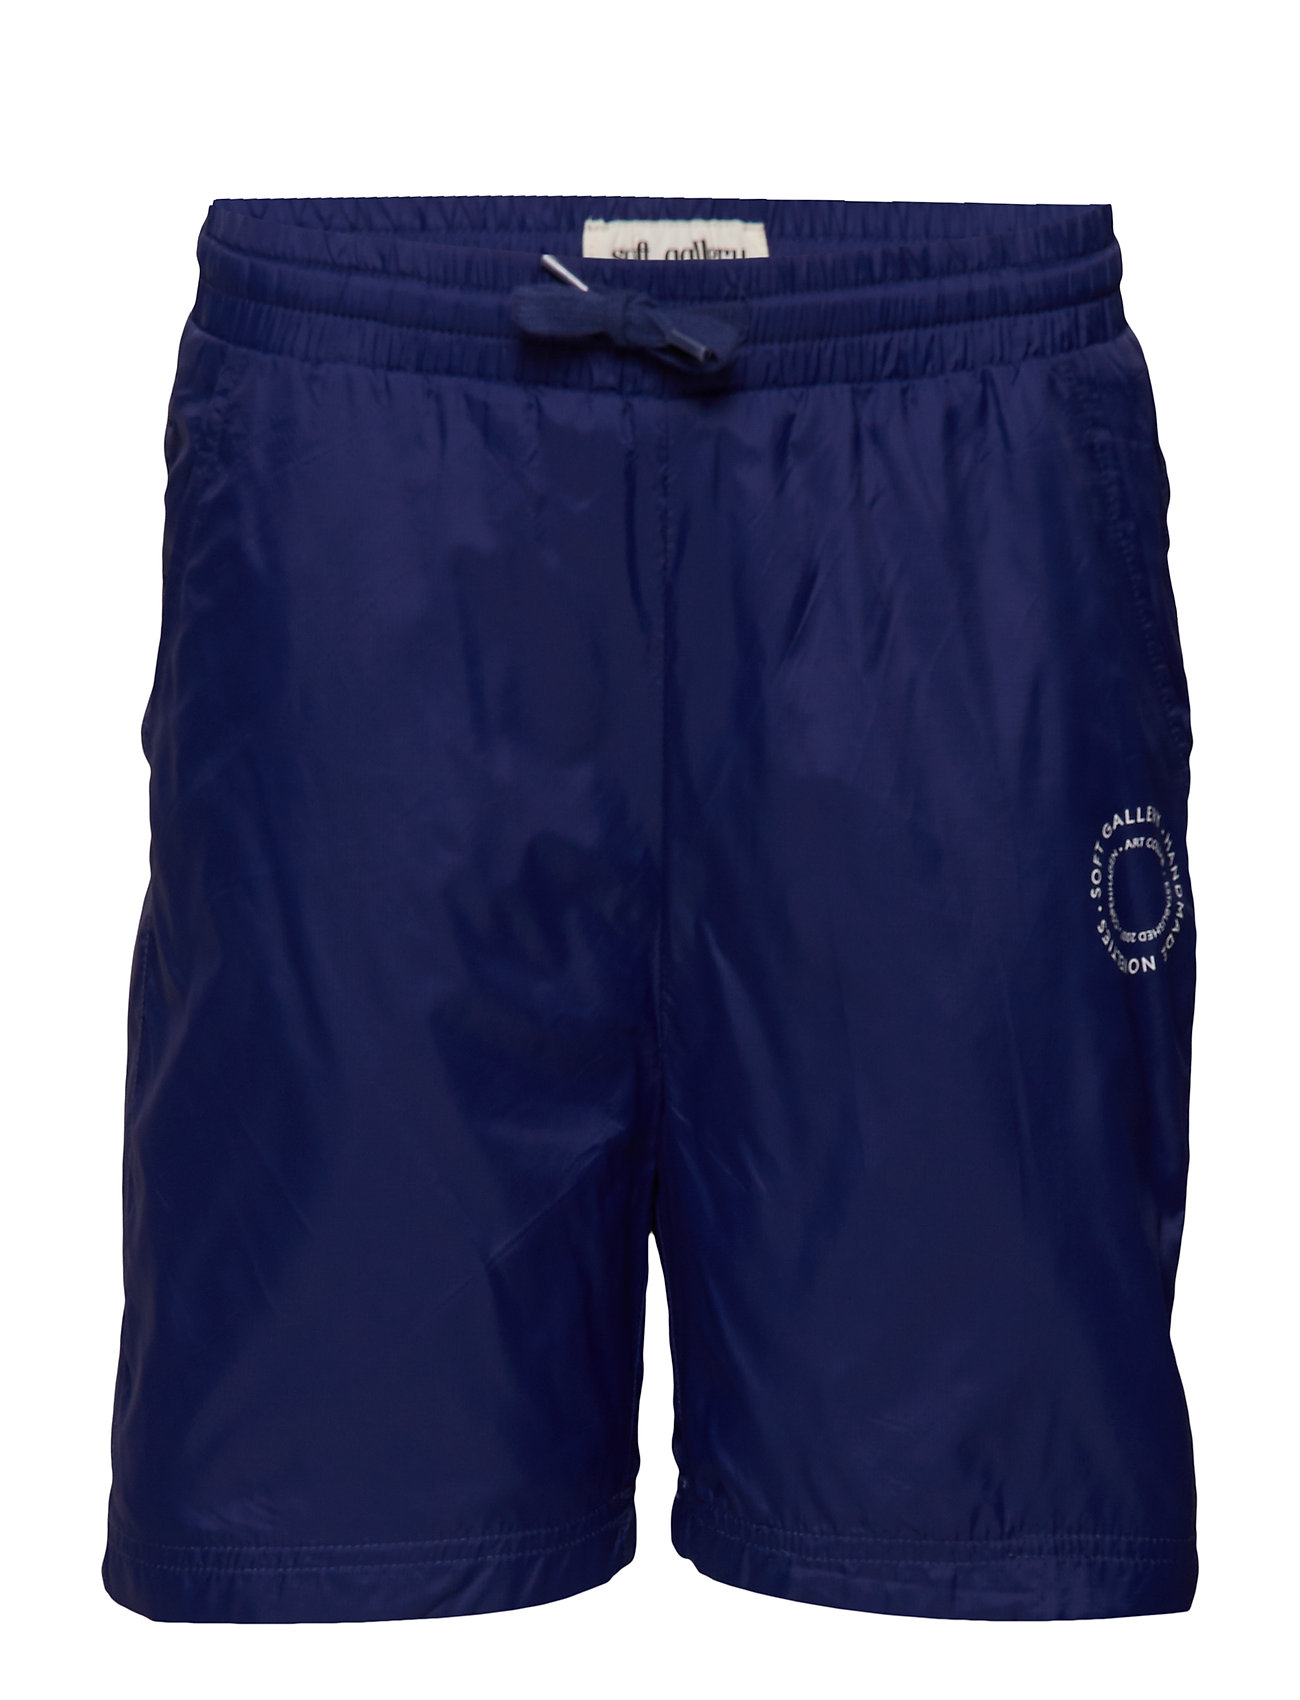 Soft Gallery Damon Shorts - DRESS BLUE